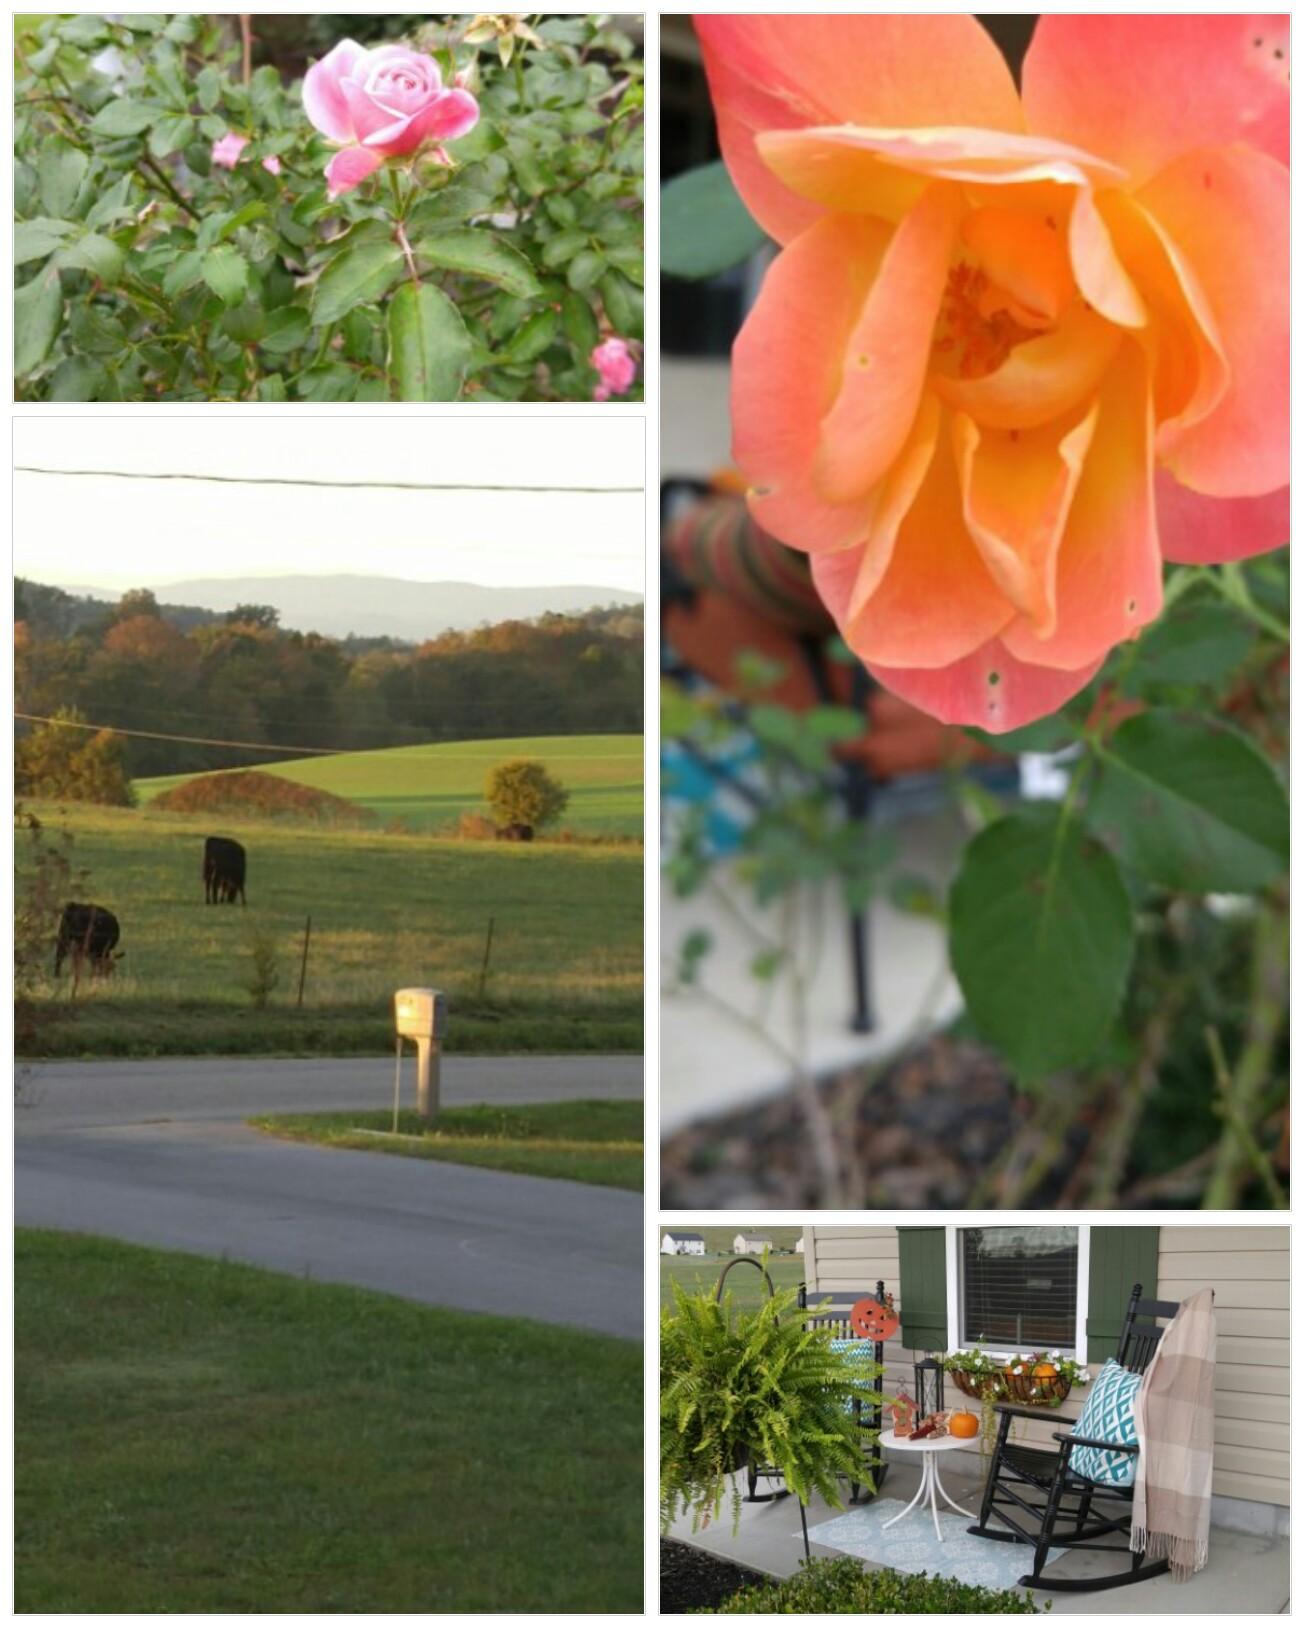 161013_152054_collage-1.jpg